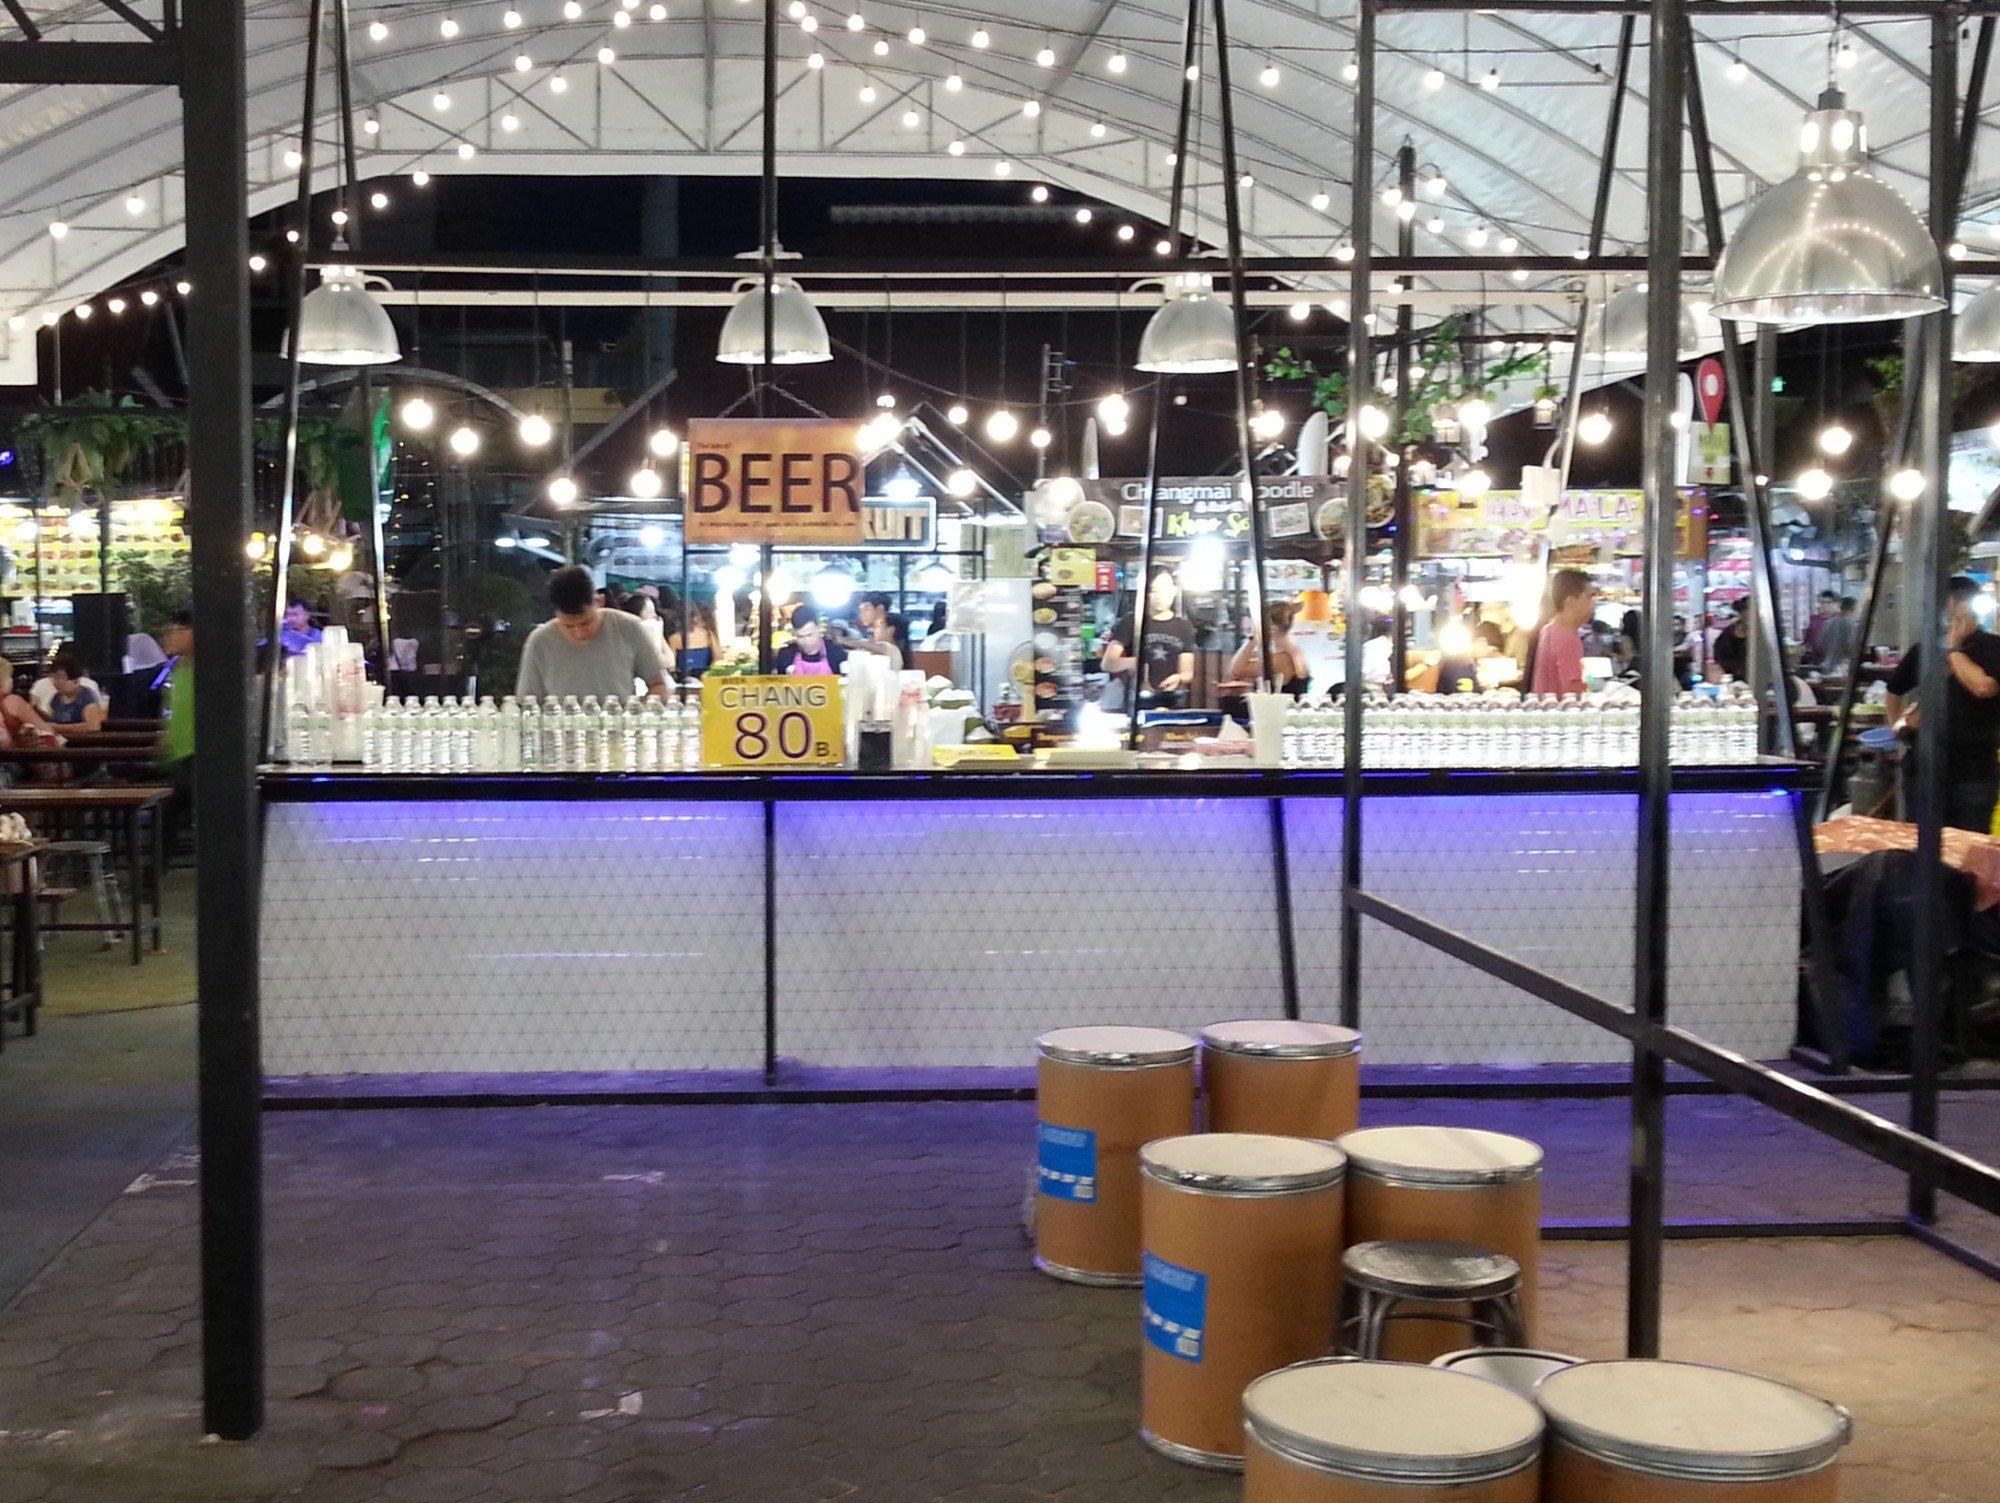 Beer station at Anusarn Market